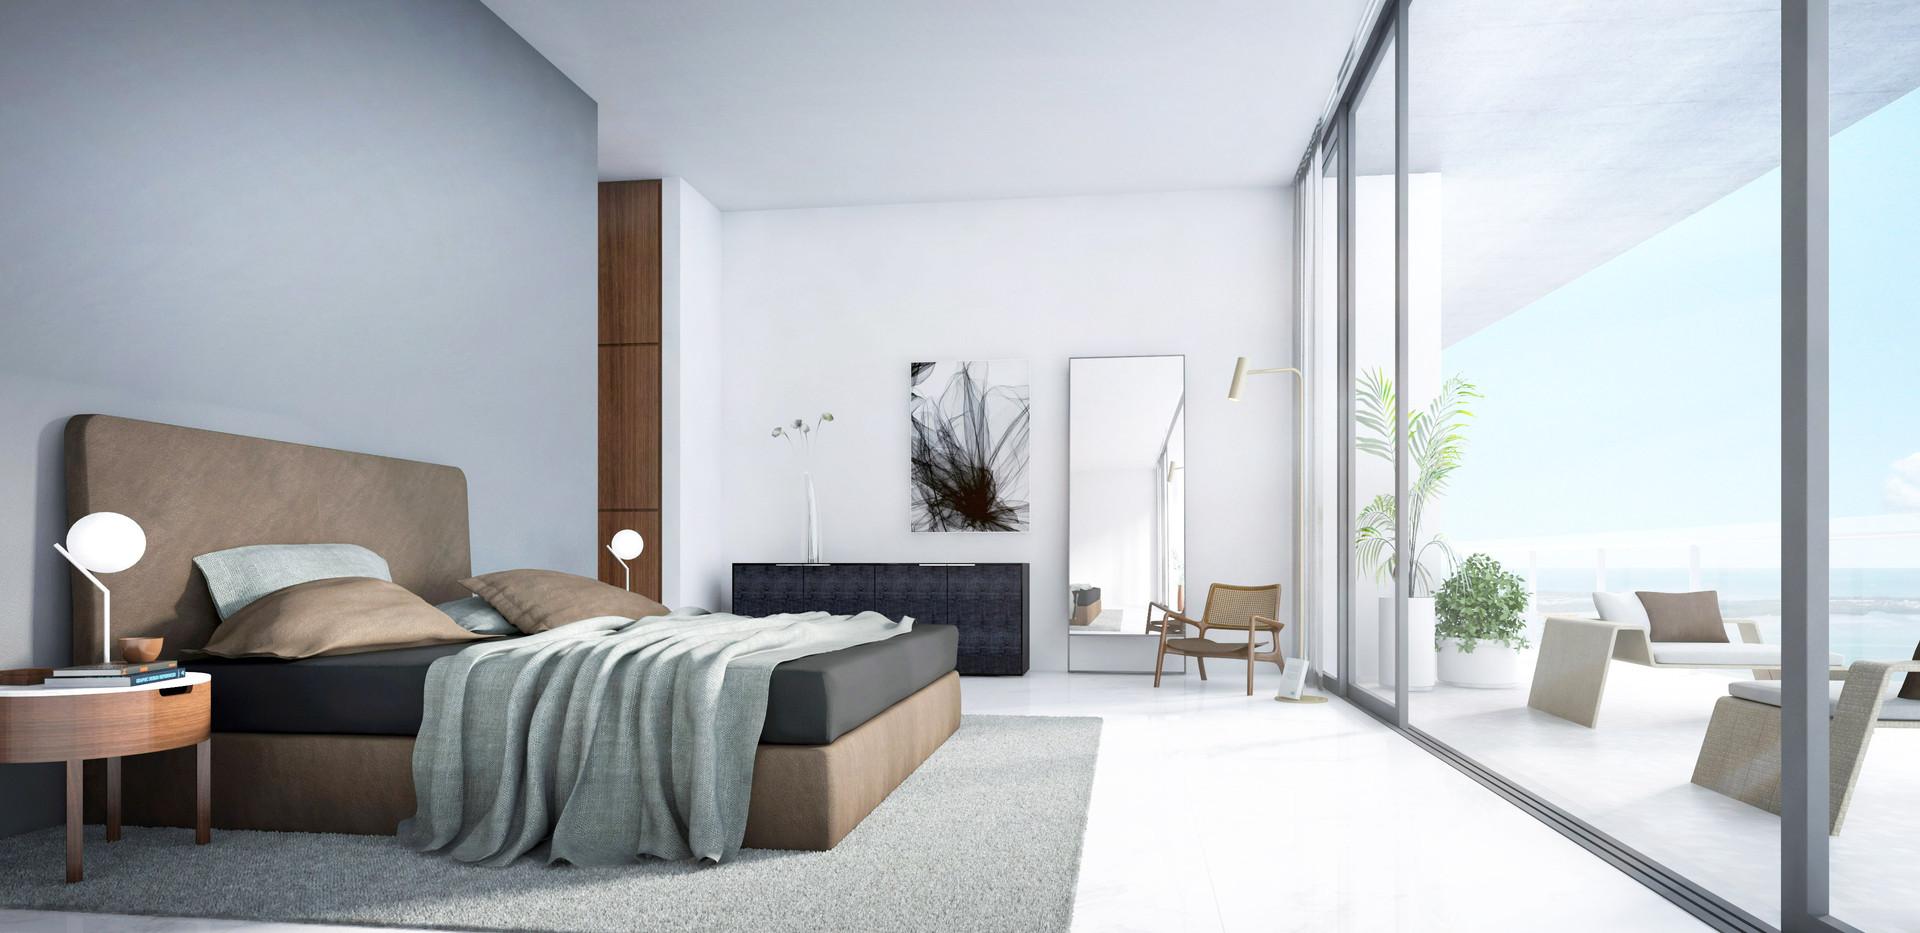 Unit 01 - Bedroom